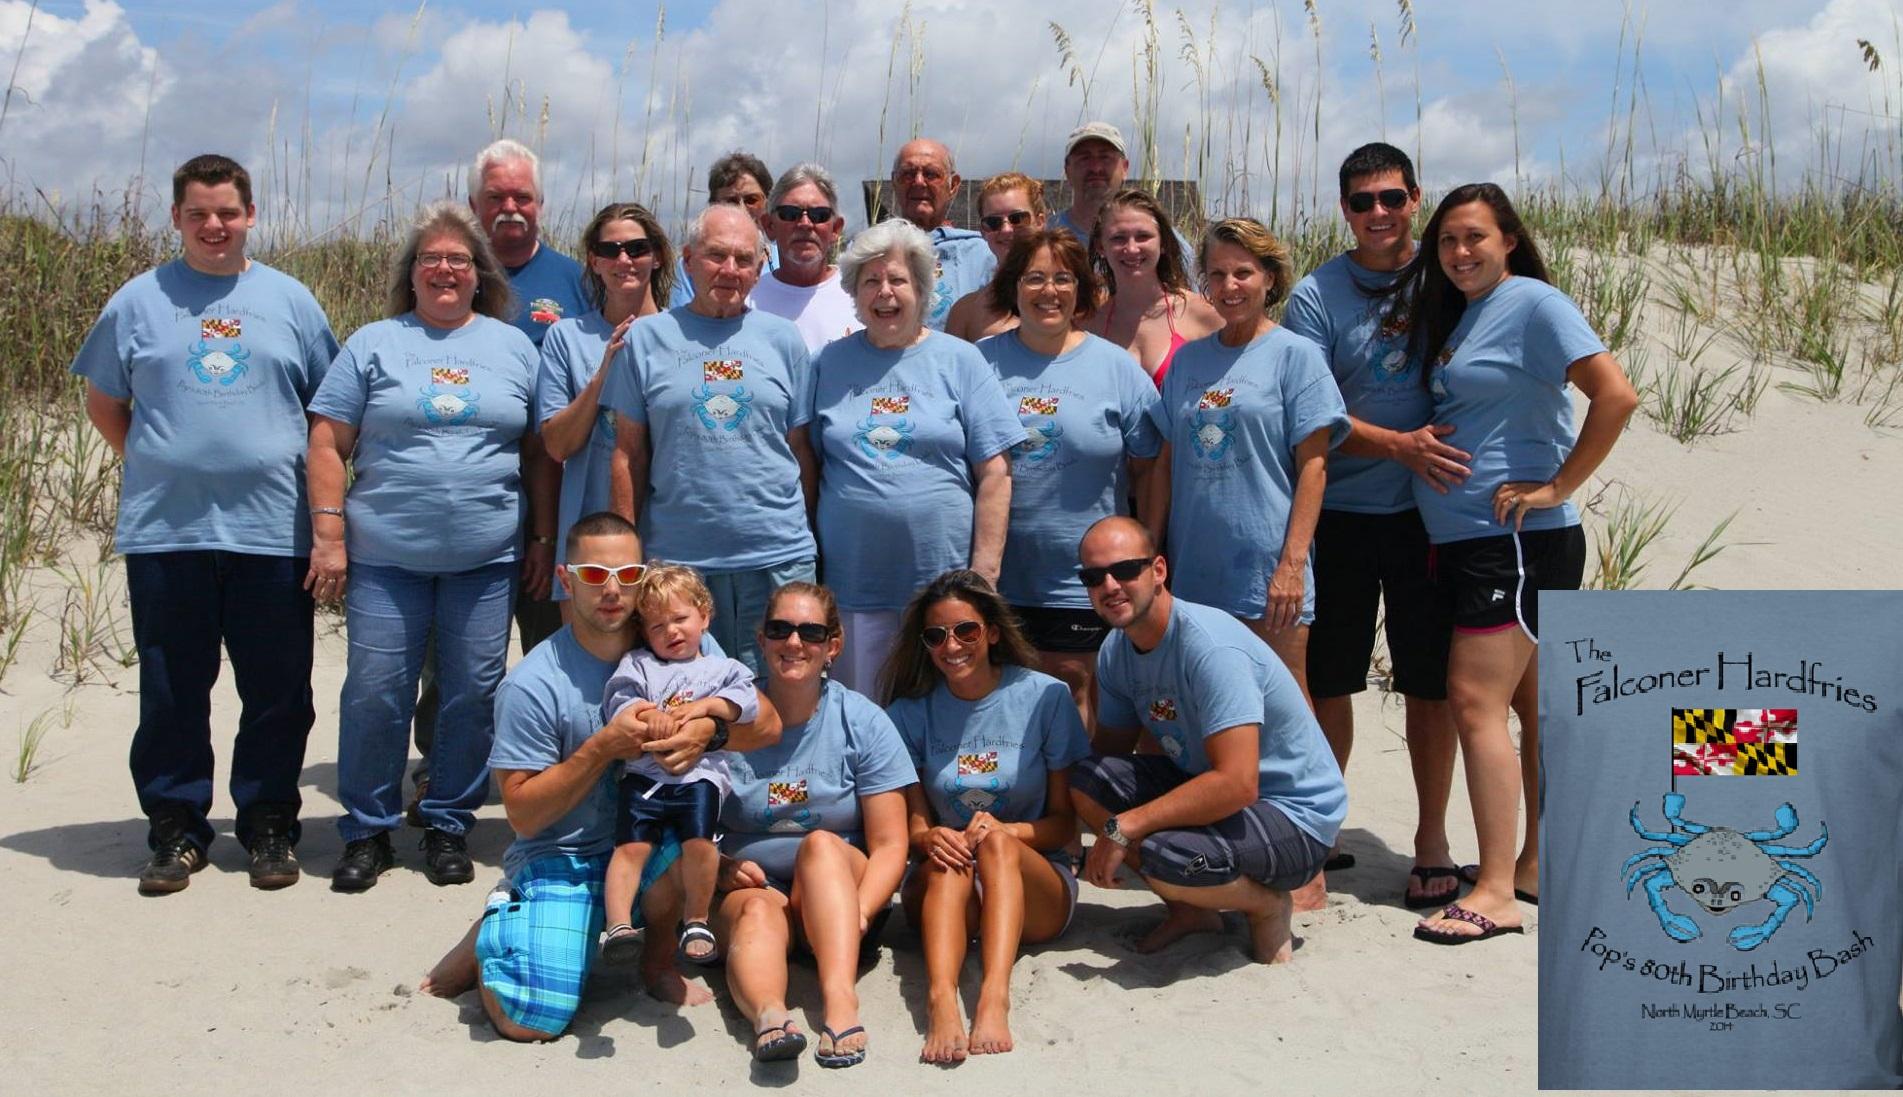 The Falconer Hardfries Pops 80th Birthday Bash T Shirt Photo